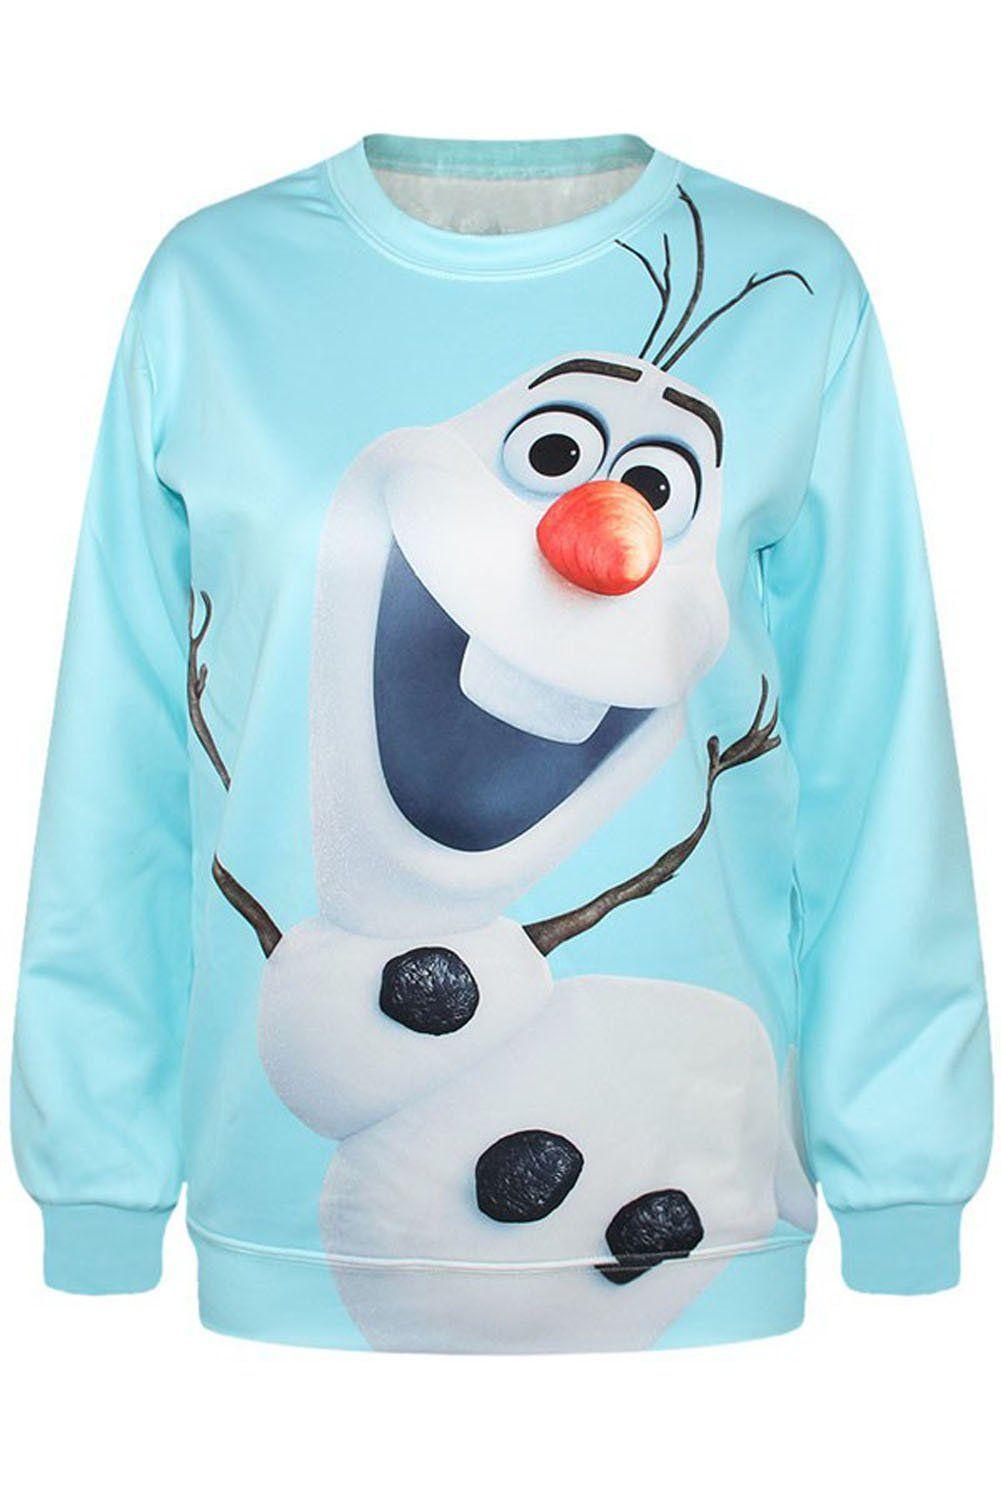 Maykool Women S Light Blue Frozen Snowman Print Sweatshirt Size One Size Printed Sweatshirts Sweatshirts Long Sleeve Sweatshirts [ 1502 x 1001 Pixel ]